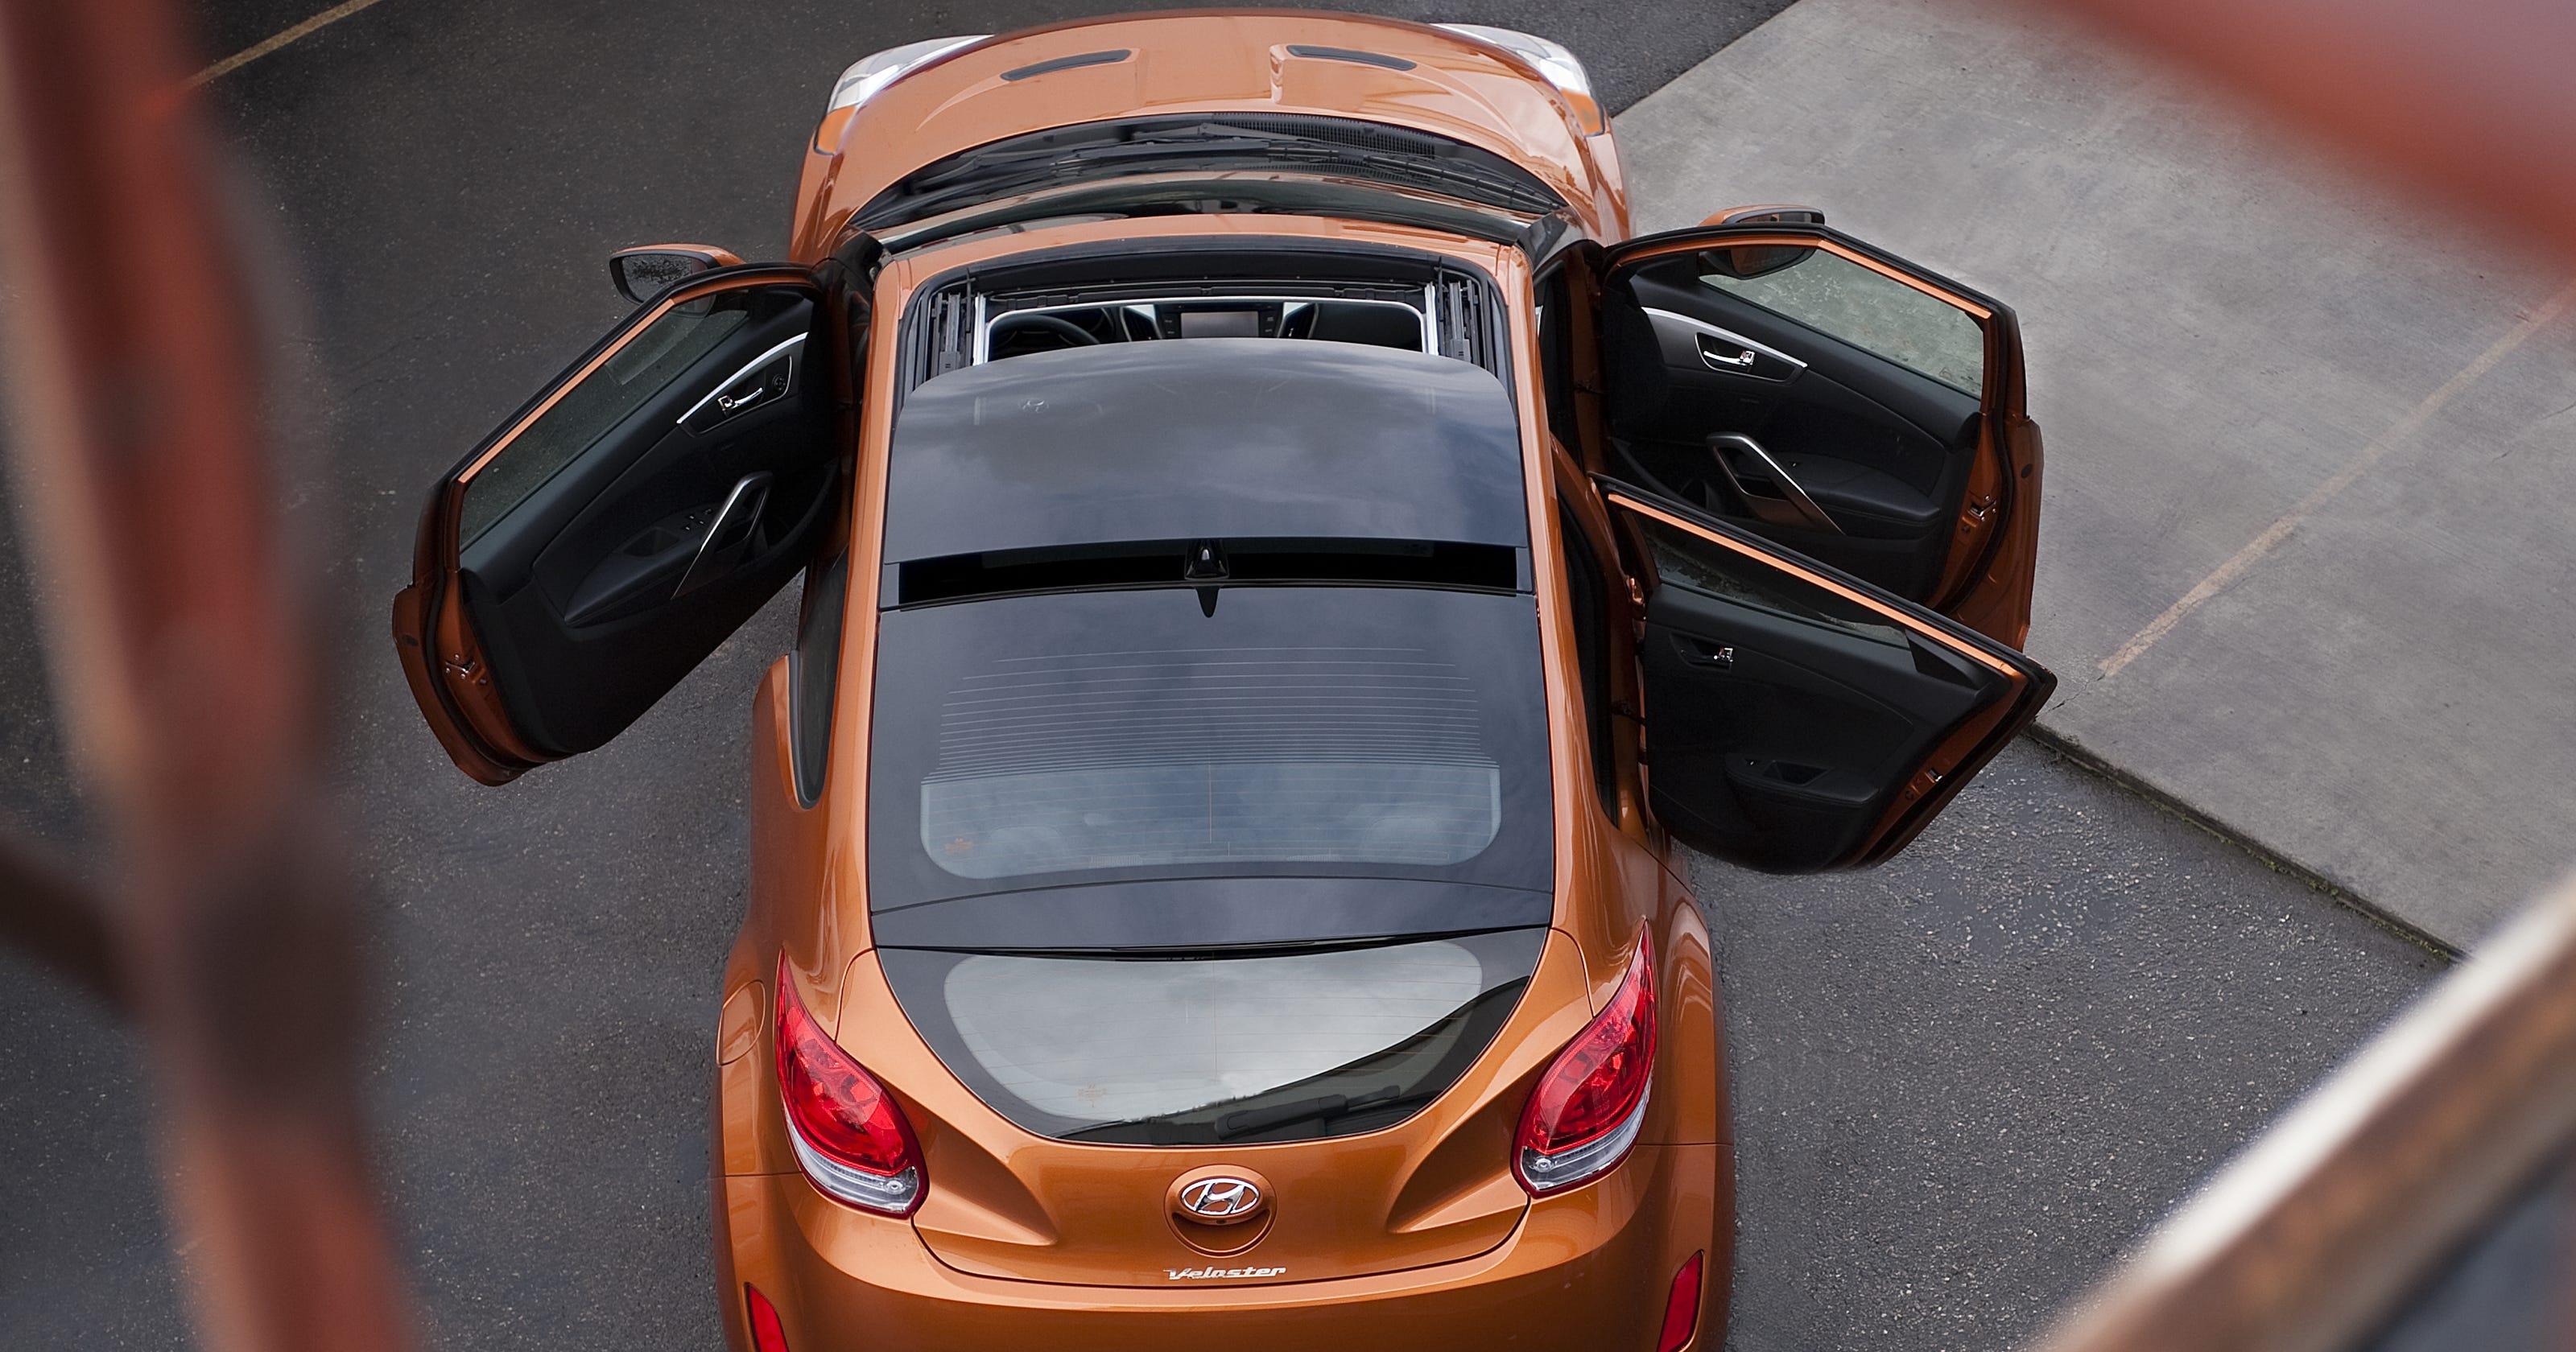 Hyundai recalls Veloster for sunroof, brake issues